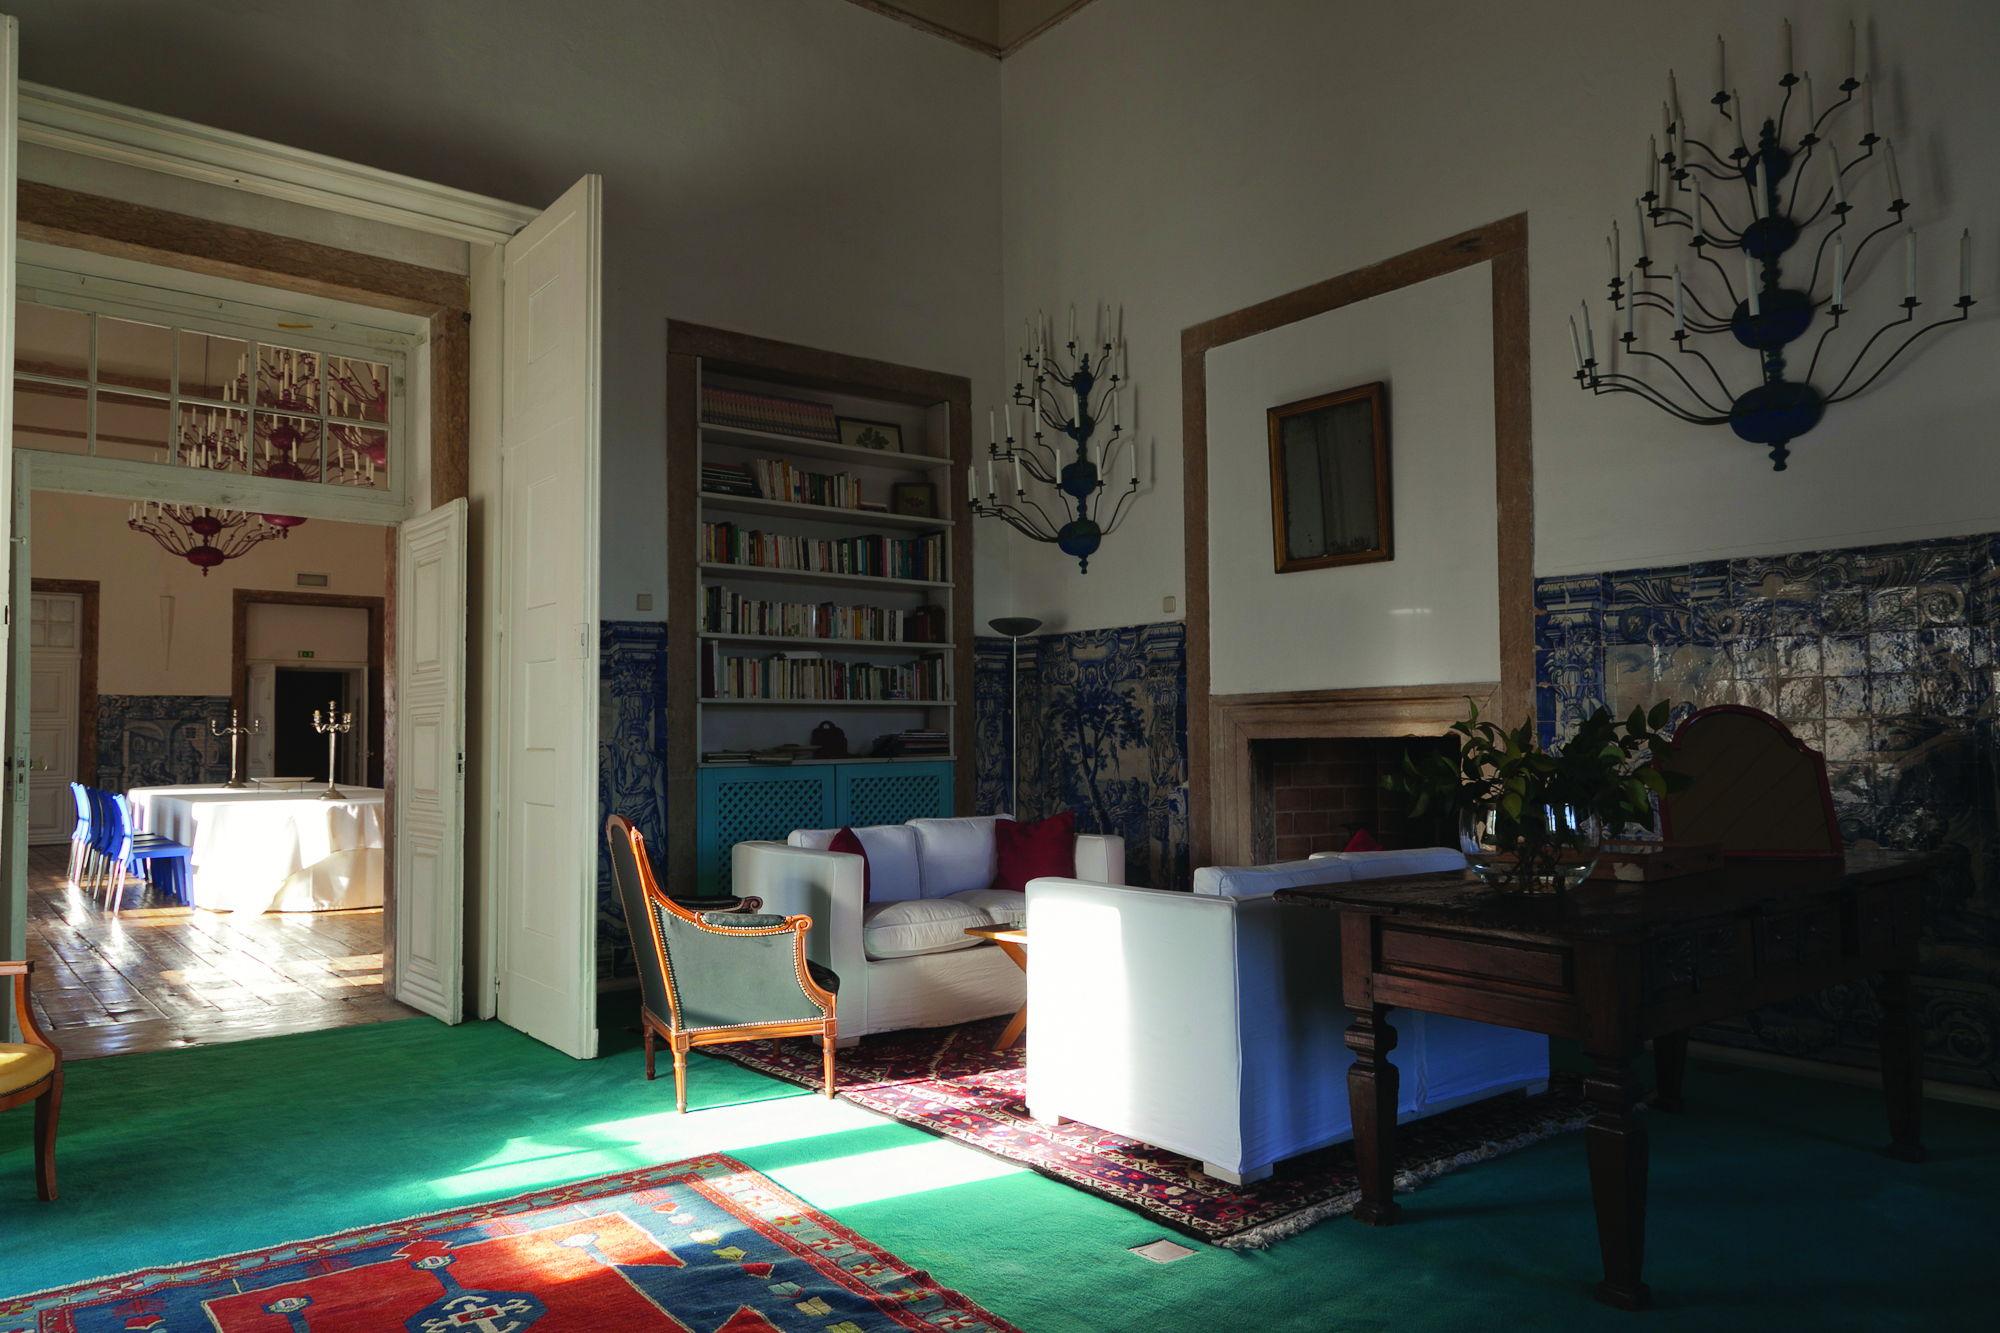 Palacio Belmonte 1º Amadeo Souza Cardoso - Joana Pinto Coelho #Lisbon #PalacioBelmonte #LuxuryHotels #TravelPortugal